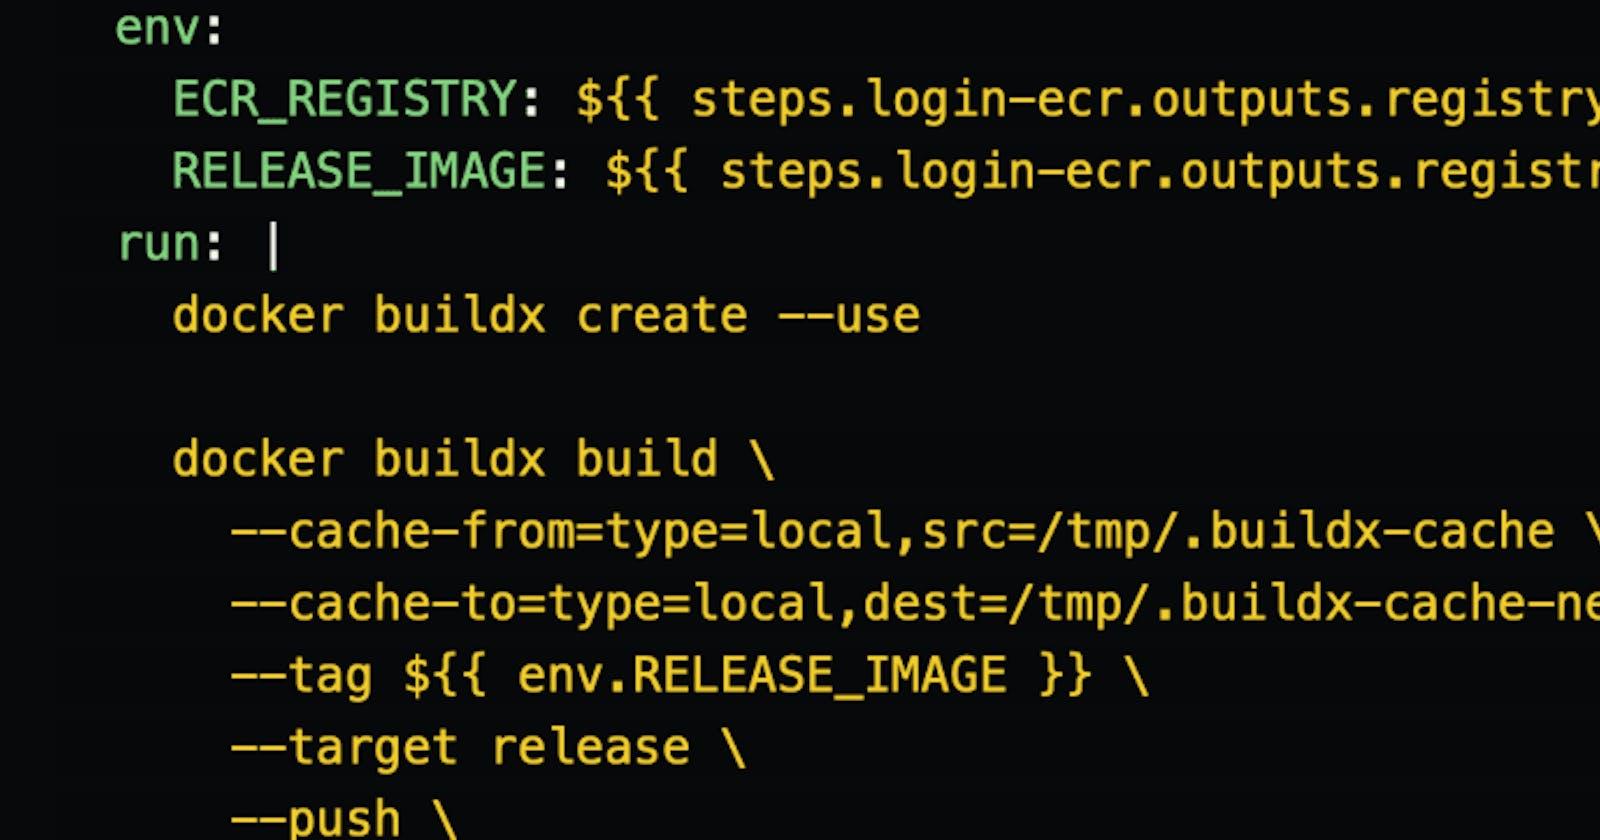 Deploy to Kubernetes using Github Actions (including Slack notification)